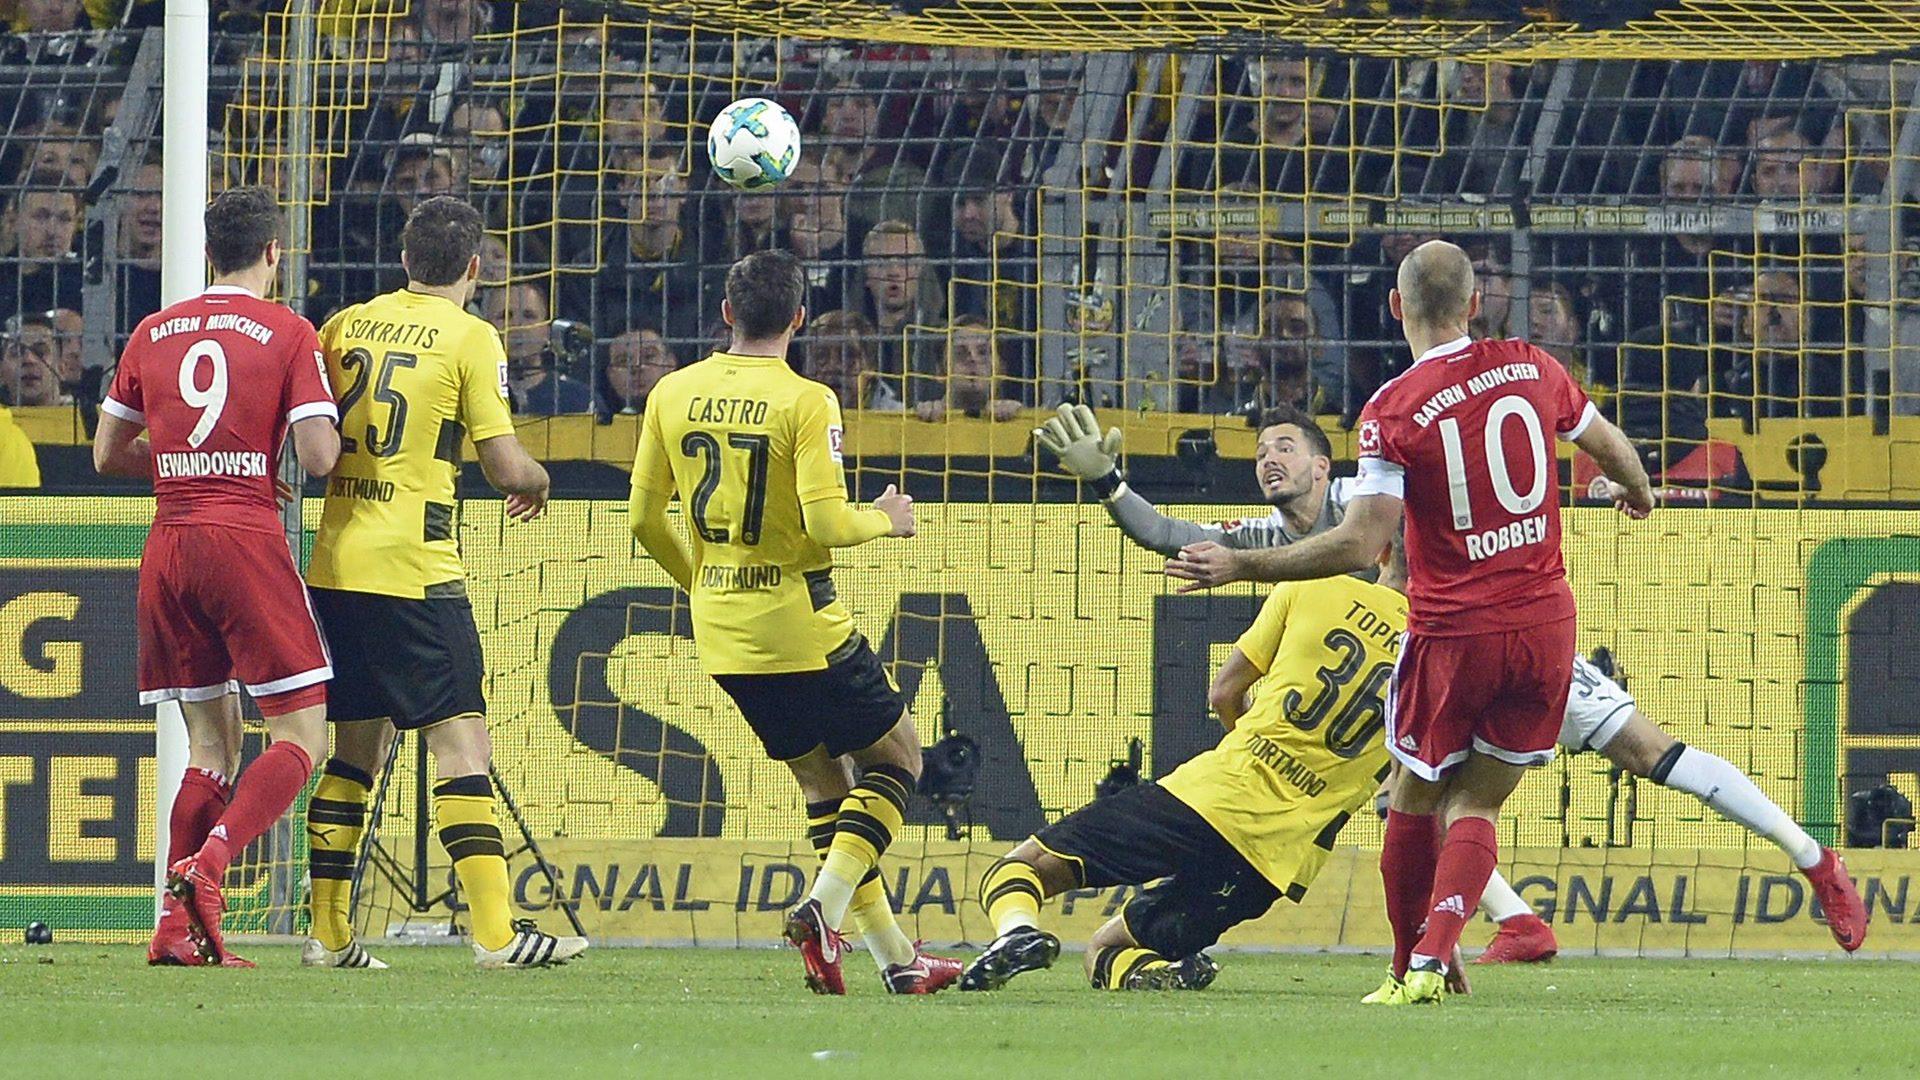 Die zehn besten Klassiker-Tore des FC Bayern München